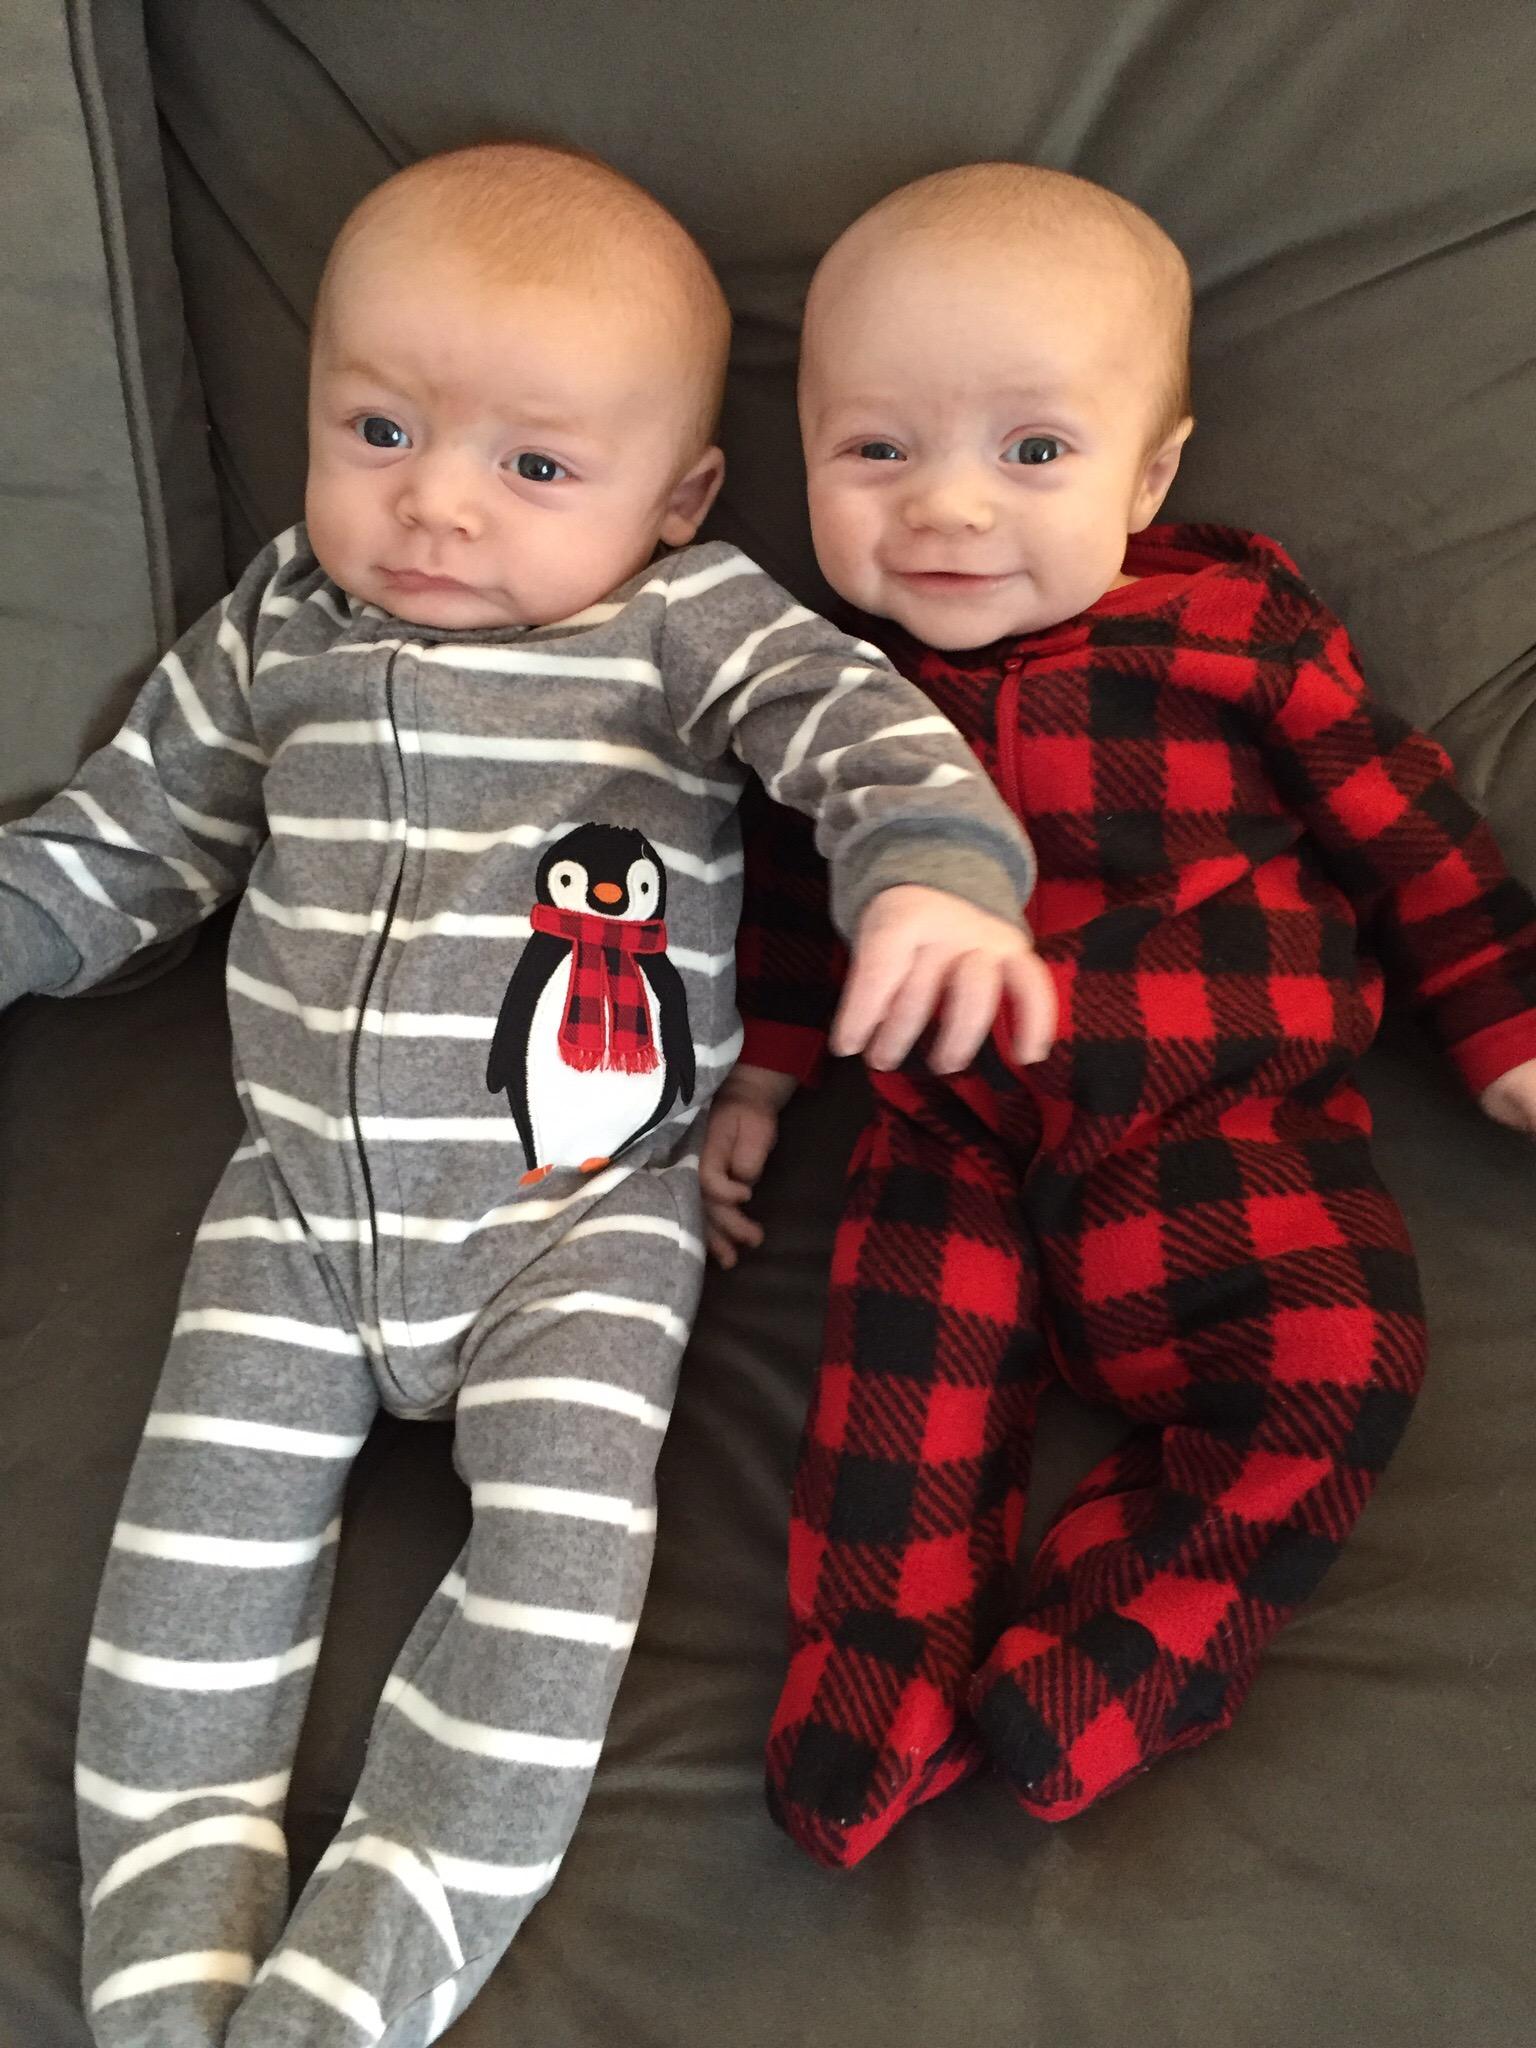 Joshua & Julian, 2 months old